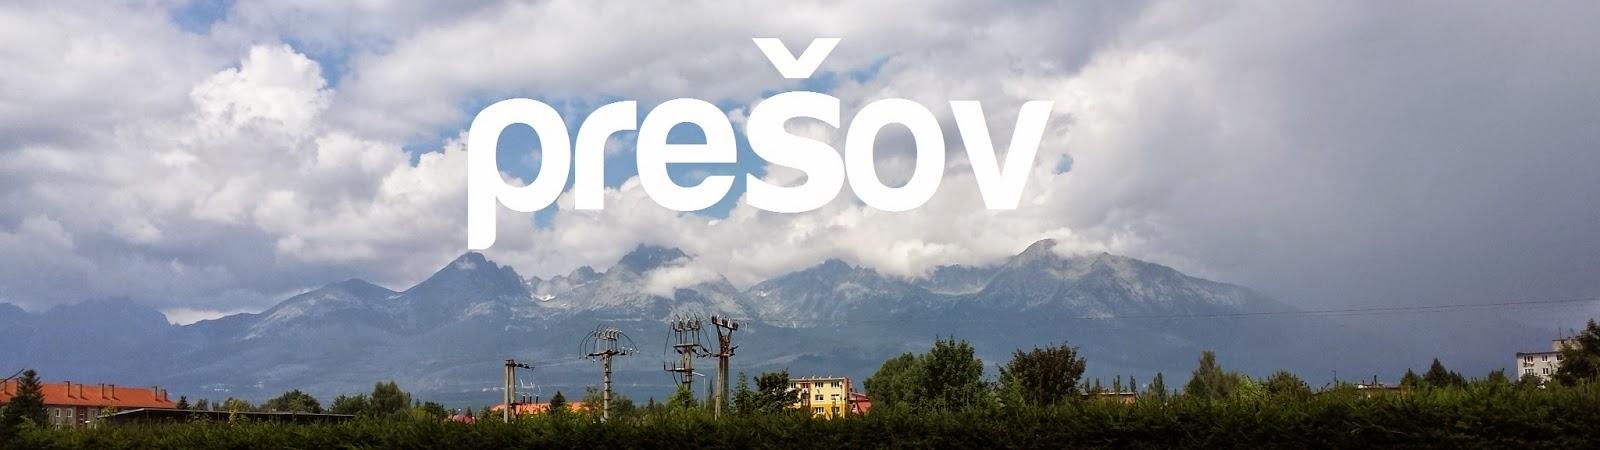 http://wikitravel.org/en/Presov